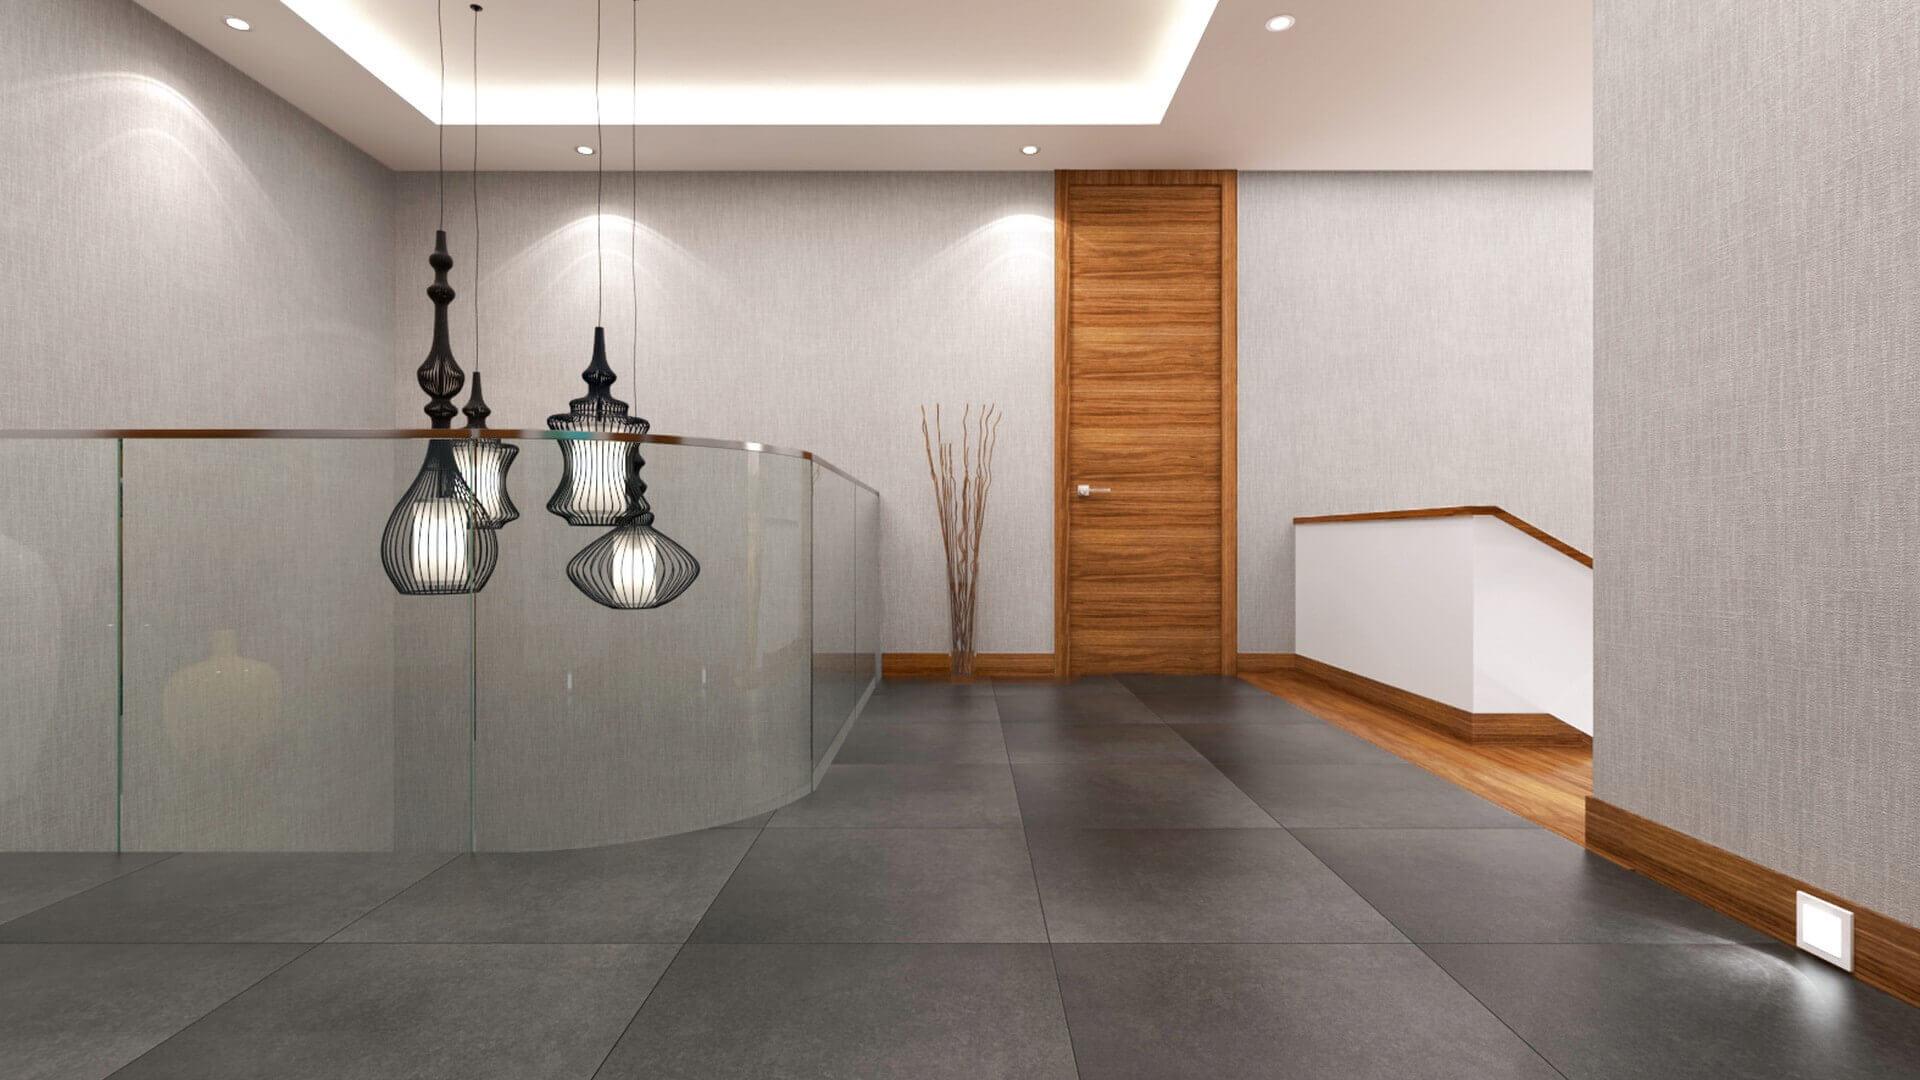 House interior architecture 2961 E. Uslu Konutu Residential